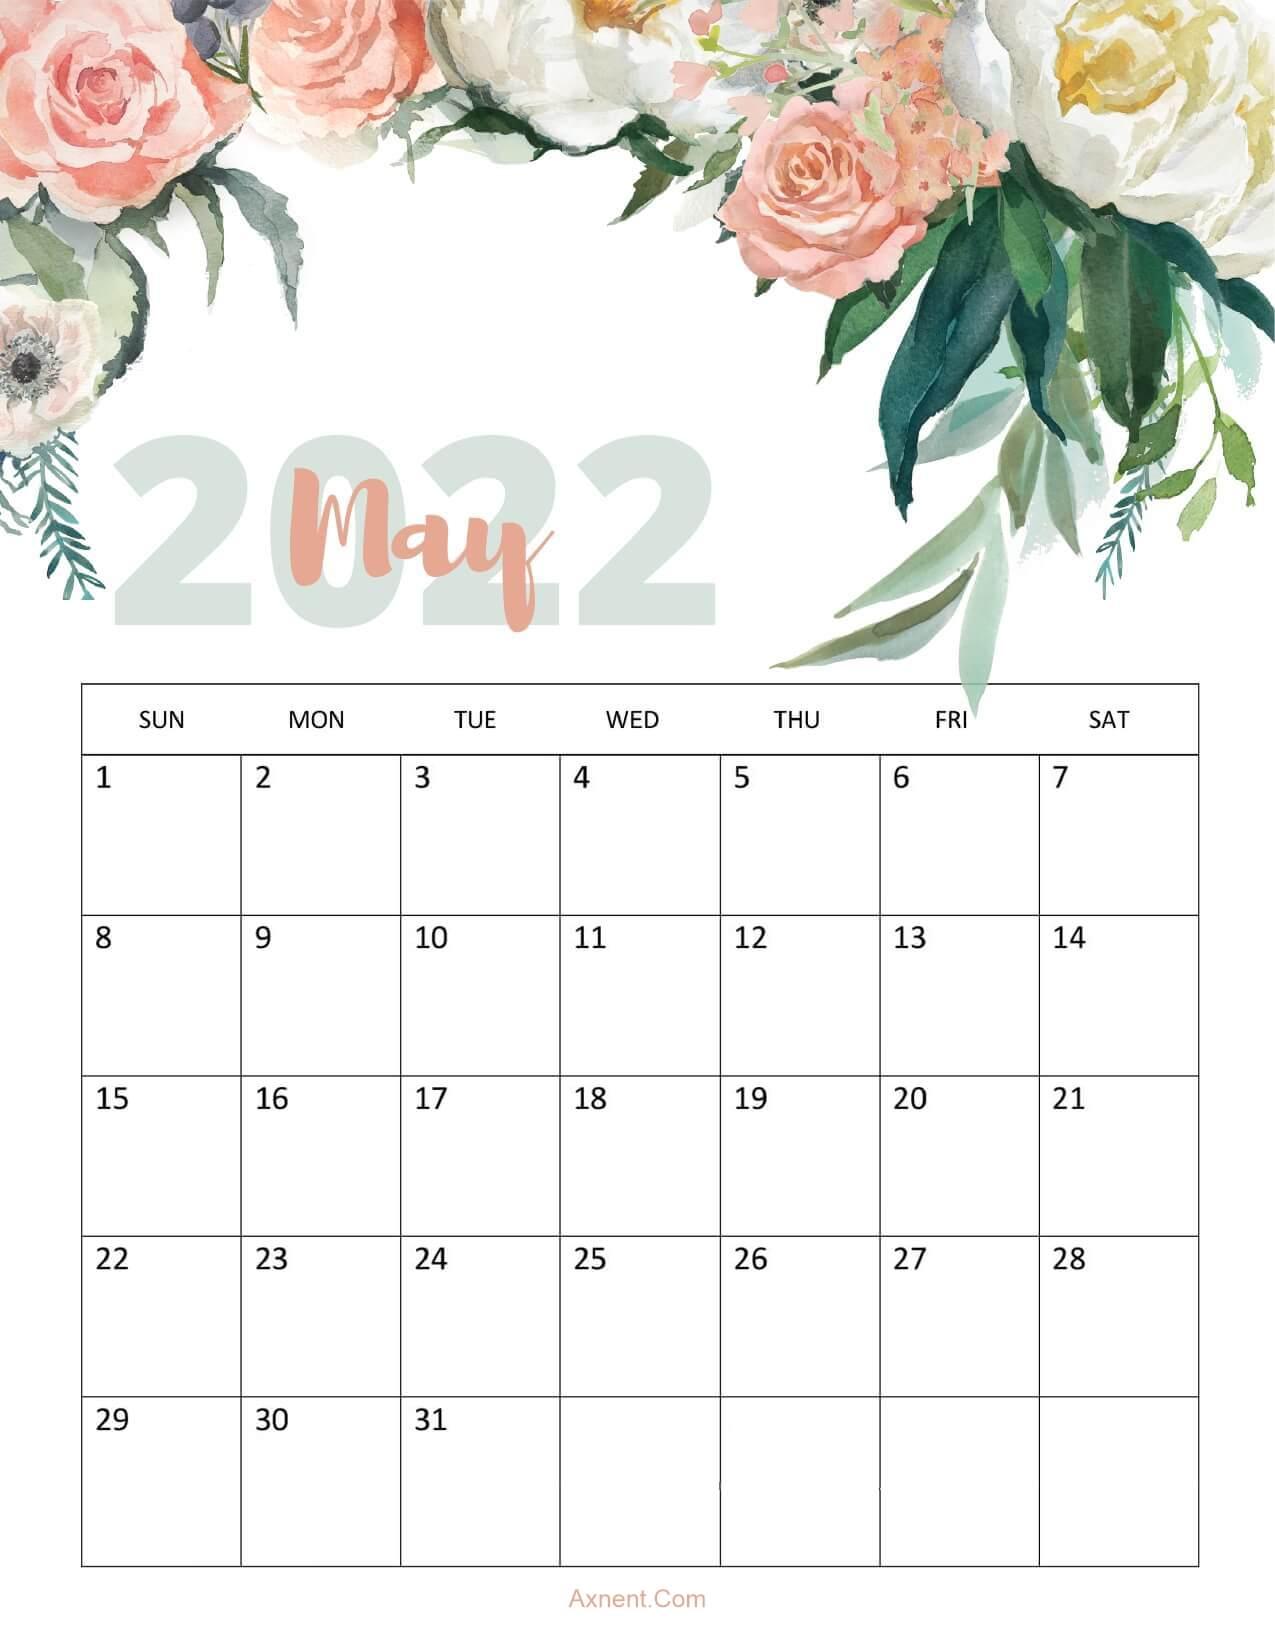 Floral May 2022 Calendar